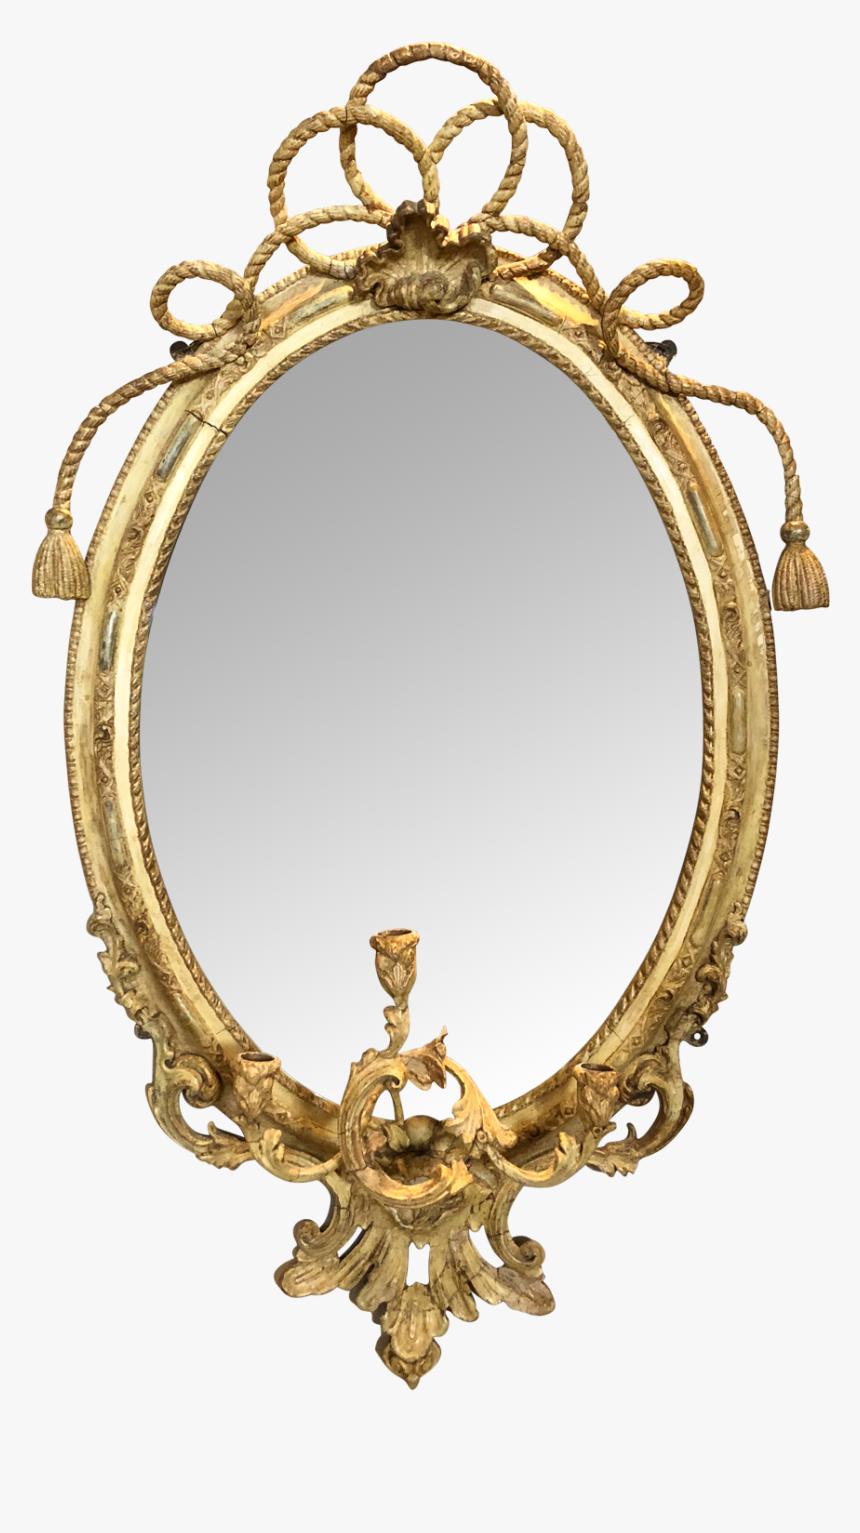 Transparent Antique Mirror Png Victorian Mirror Png Png Download Kindpng